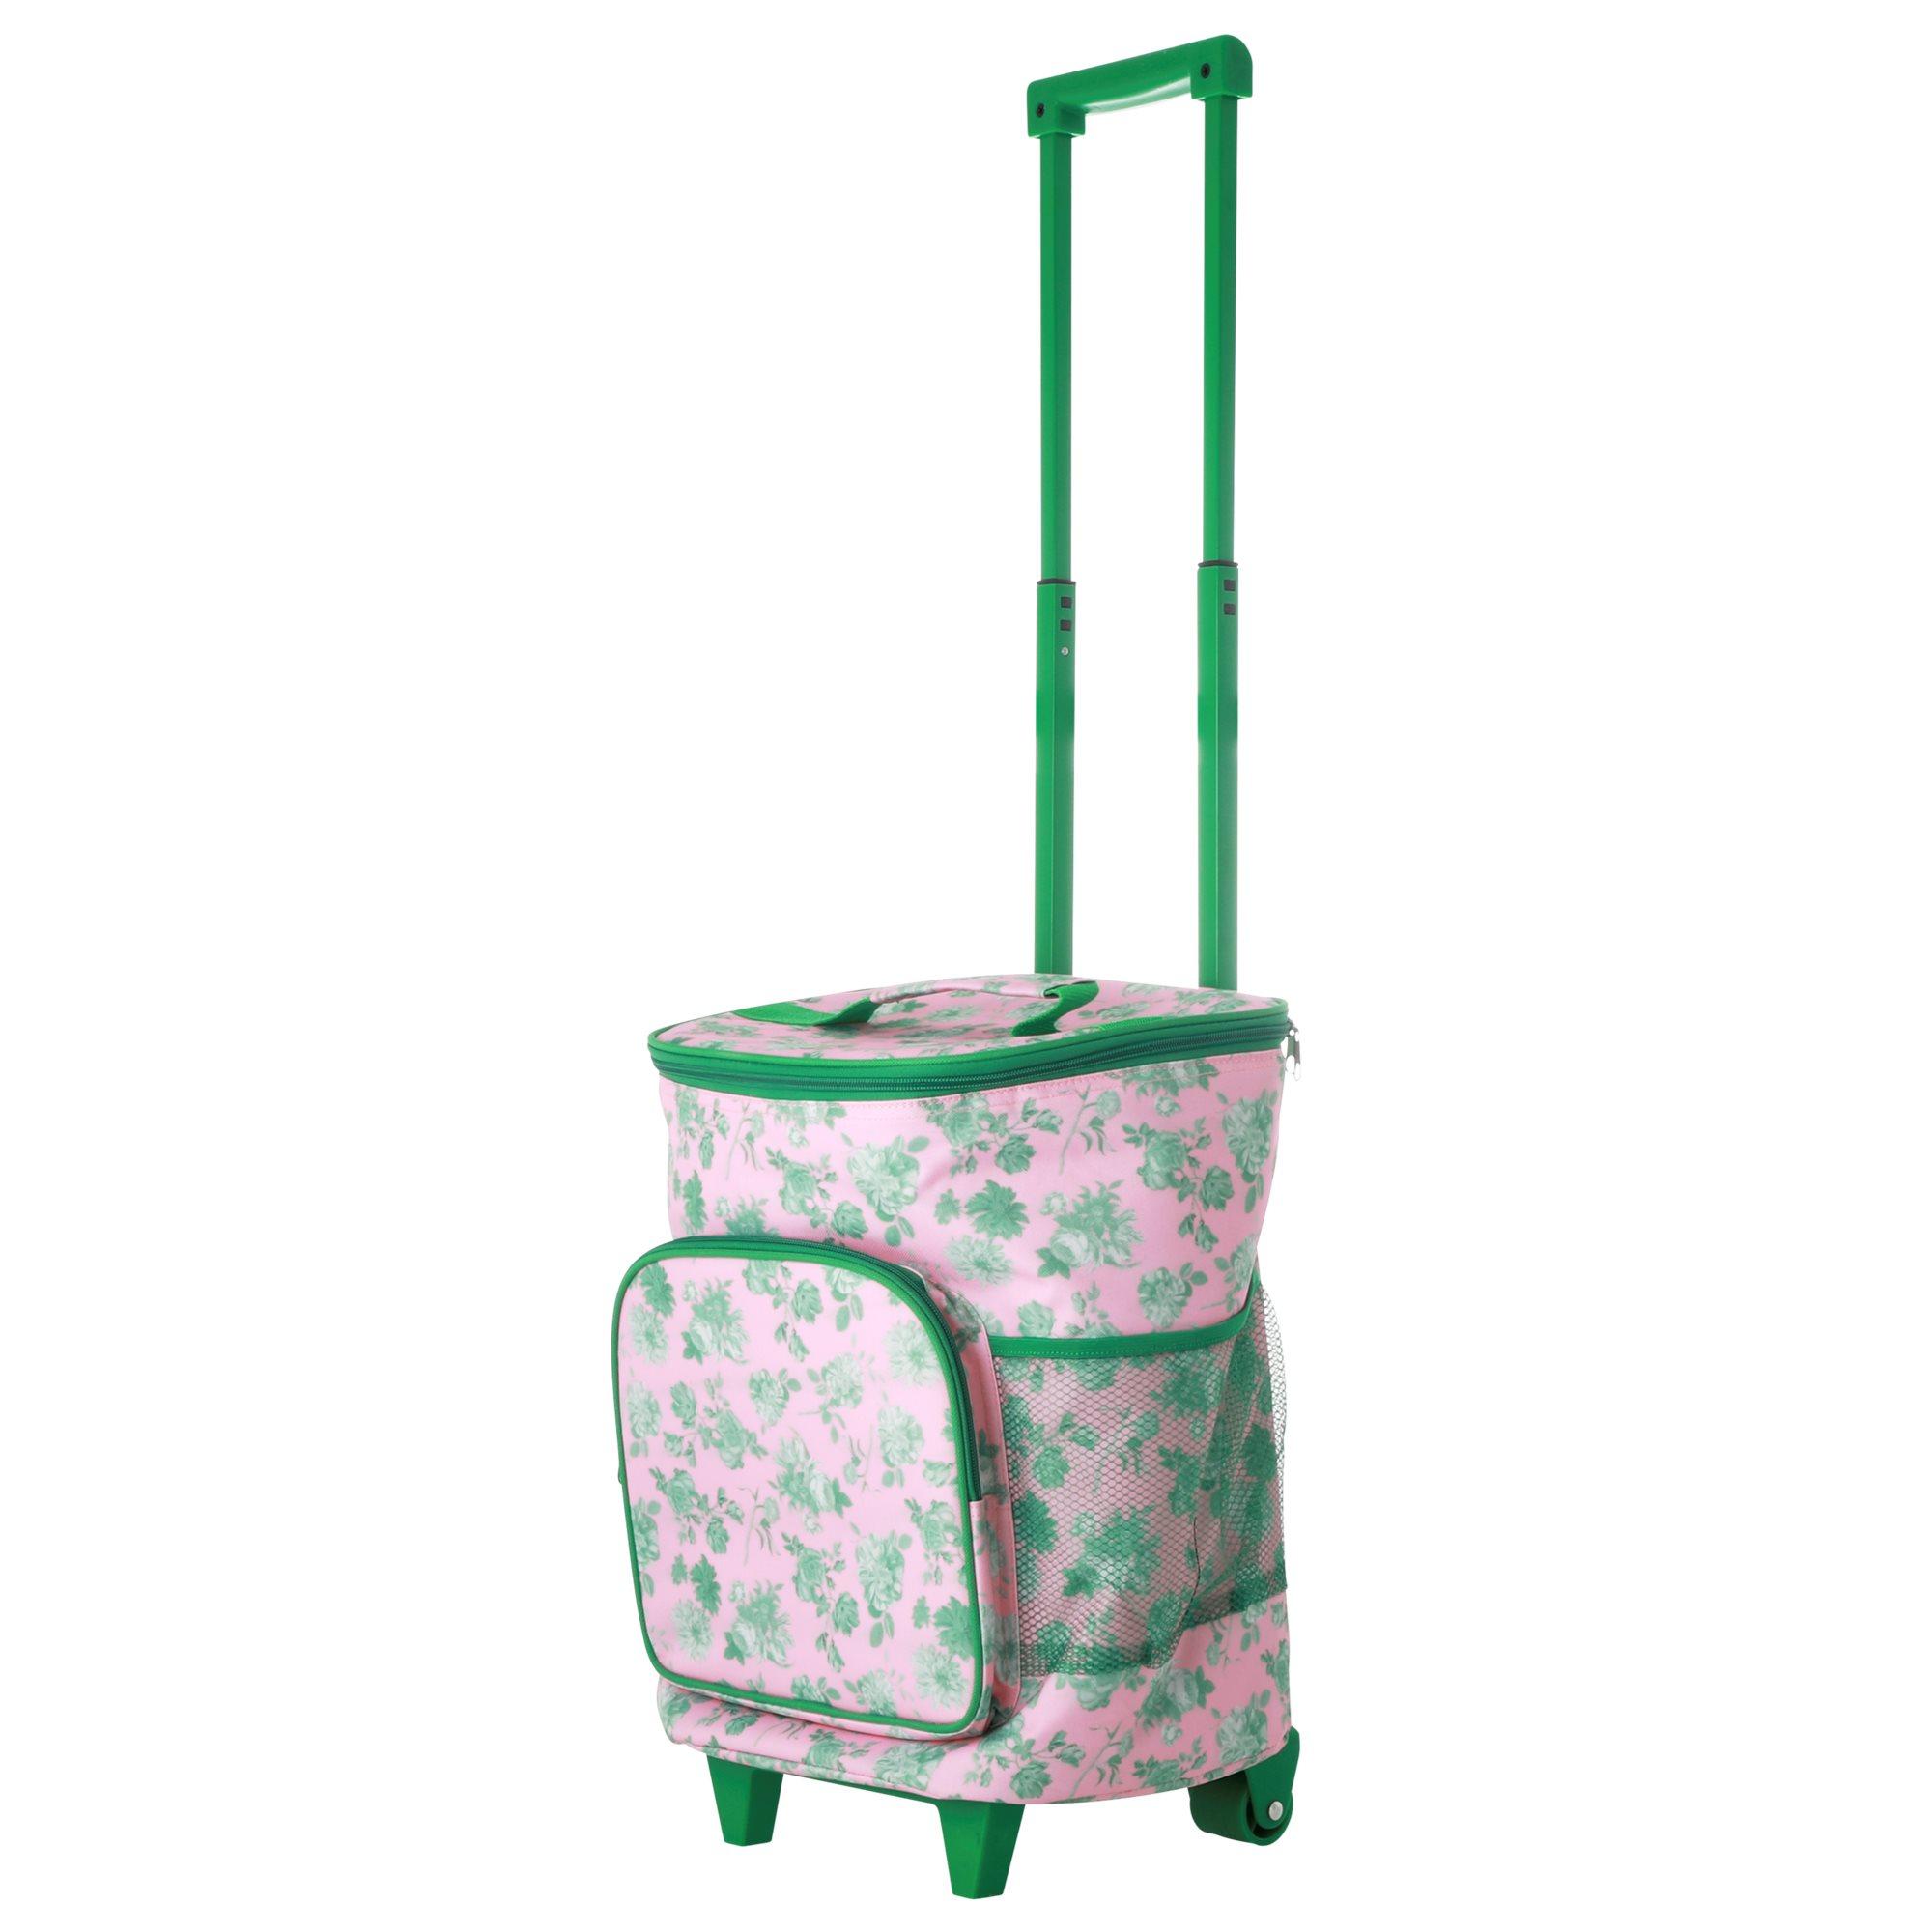 Rice - Trolley Cooler Bag w. Pink Green Rose Print - 22 L